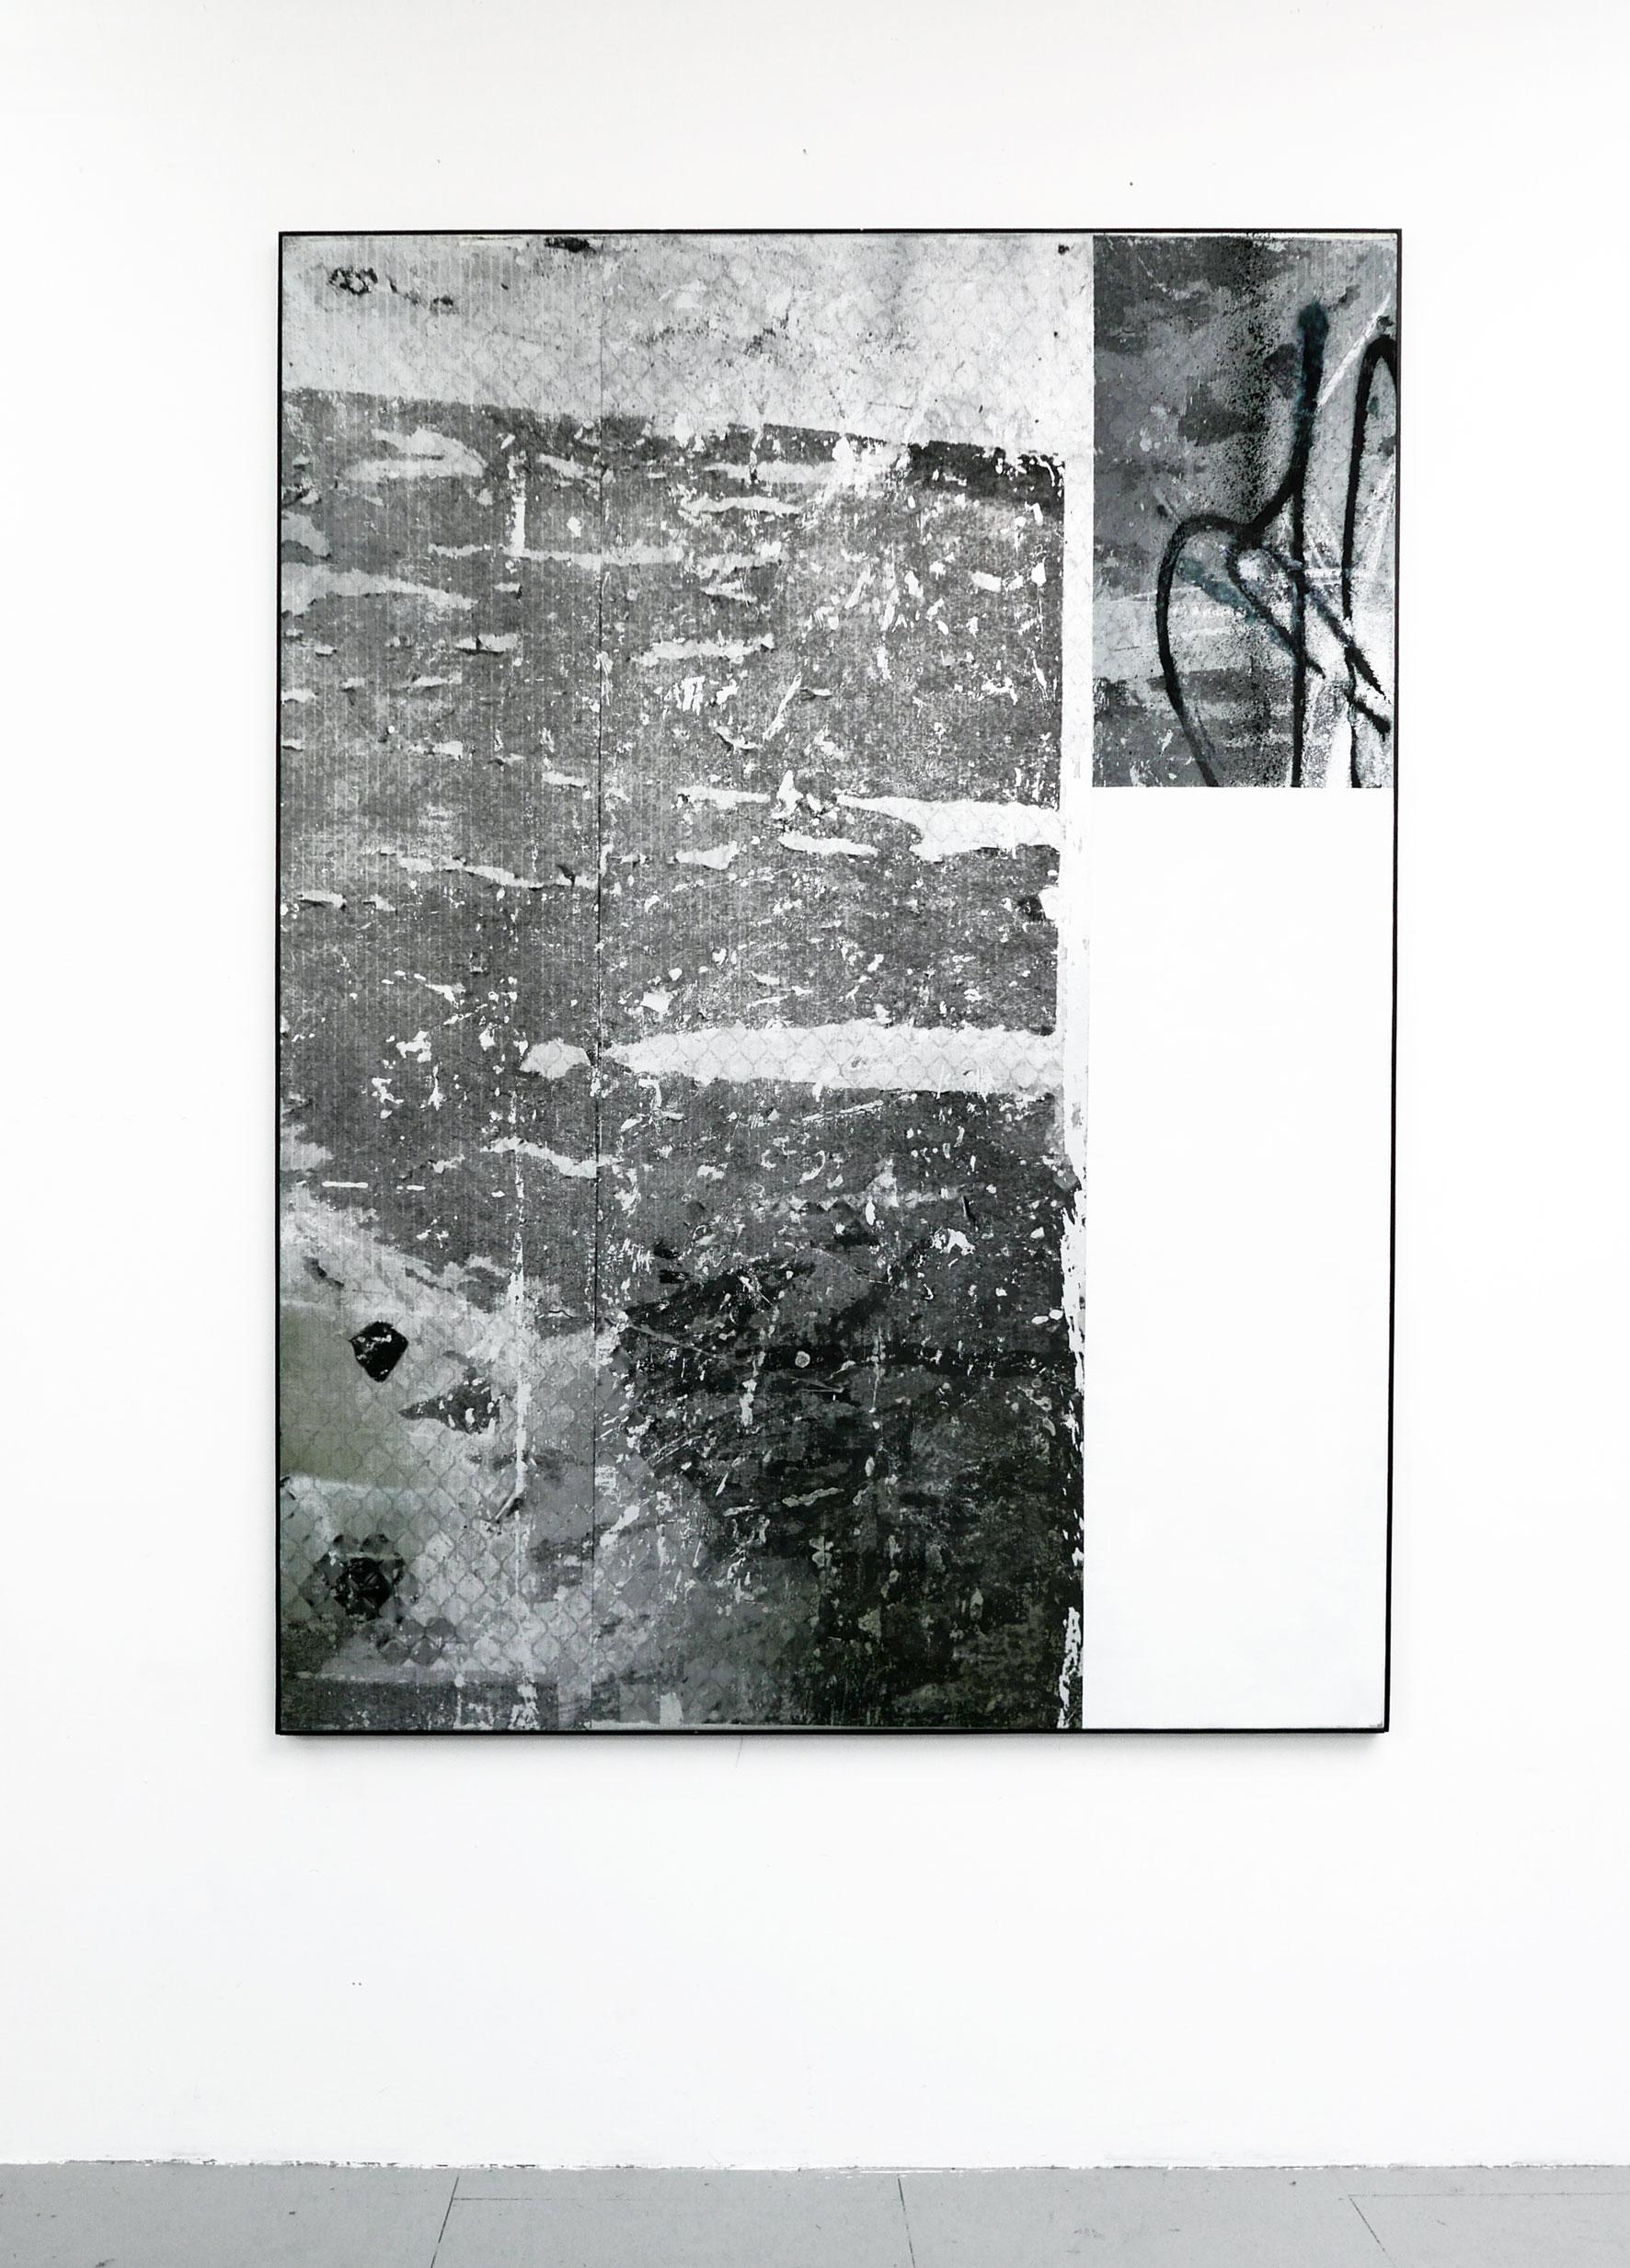 Patrol Scheme 2016.Oil toner and spray paint on canvas 150x200cm Artist Frame